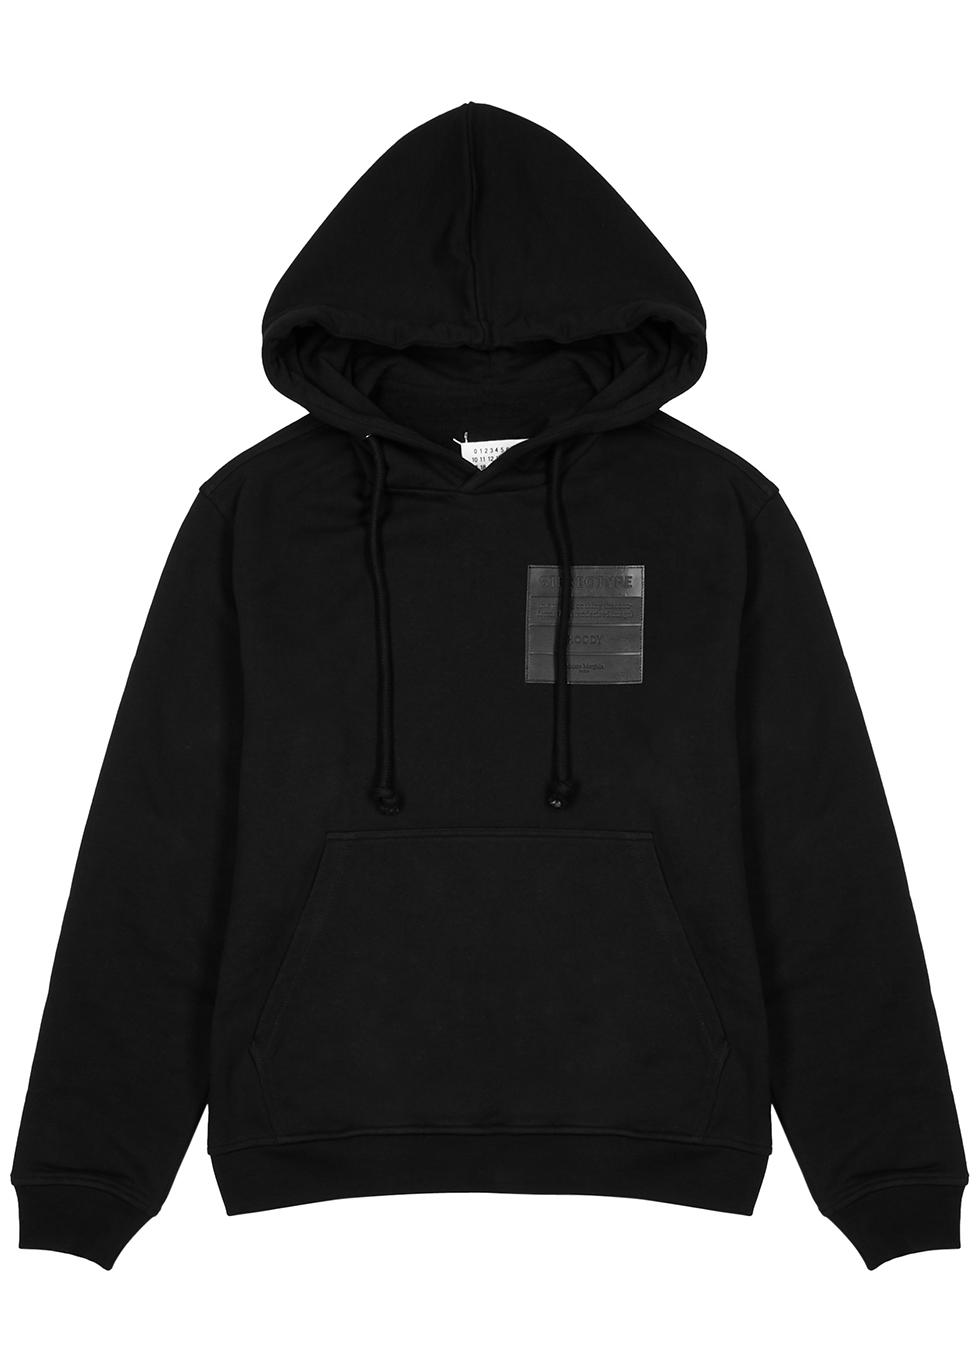 Stereotype black hooded cotton sweatshirt